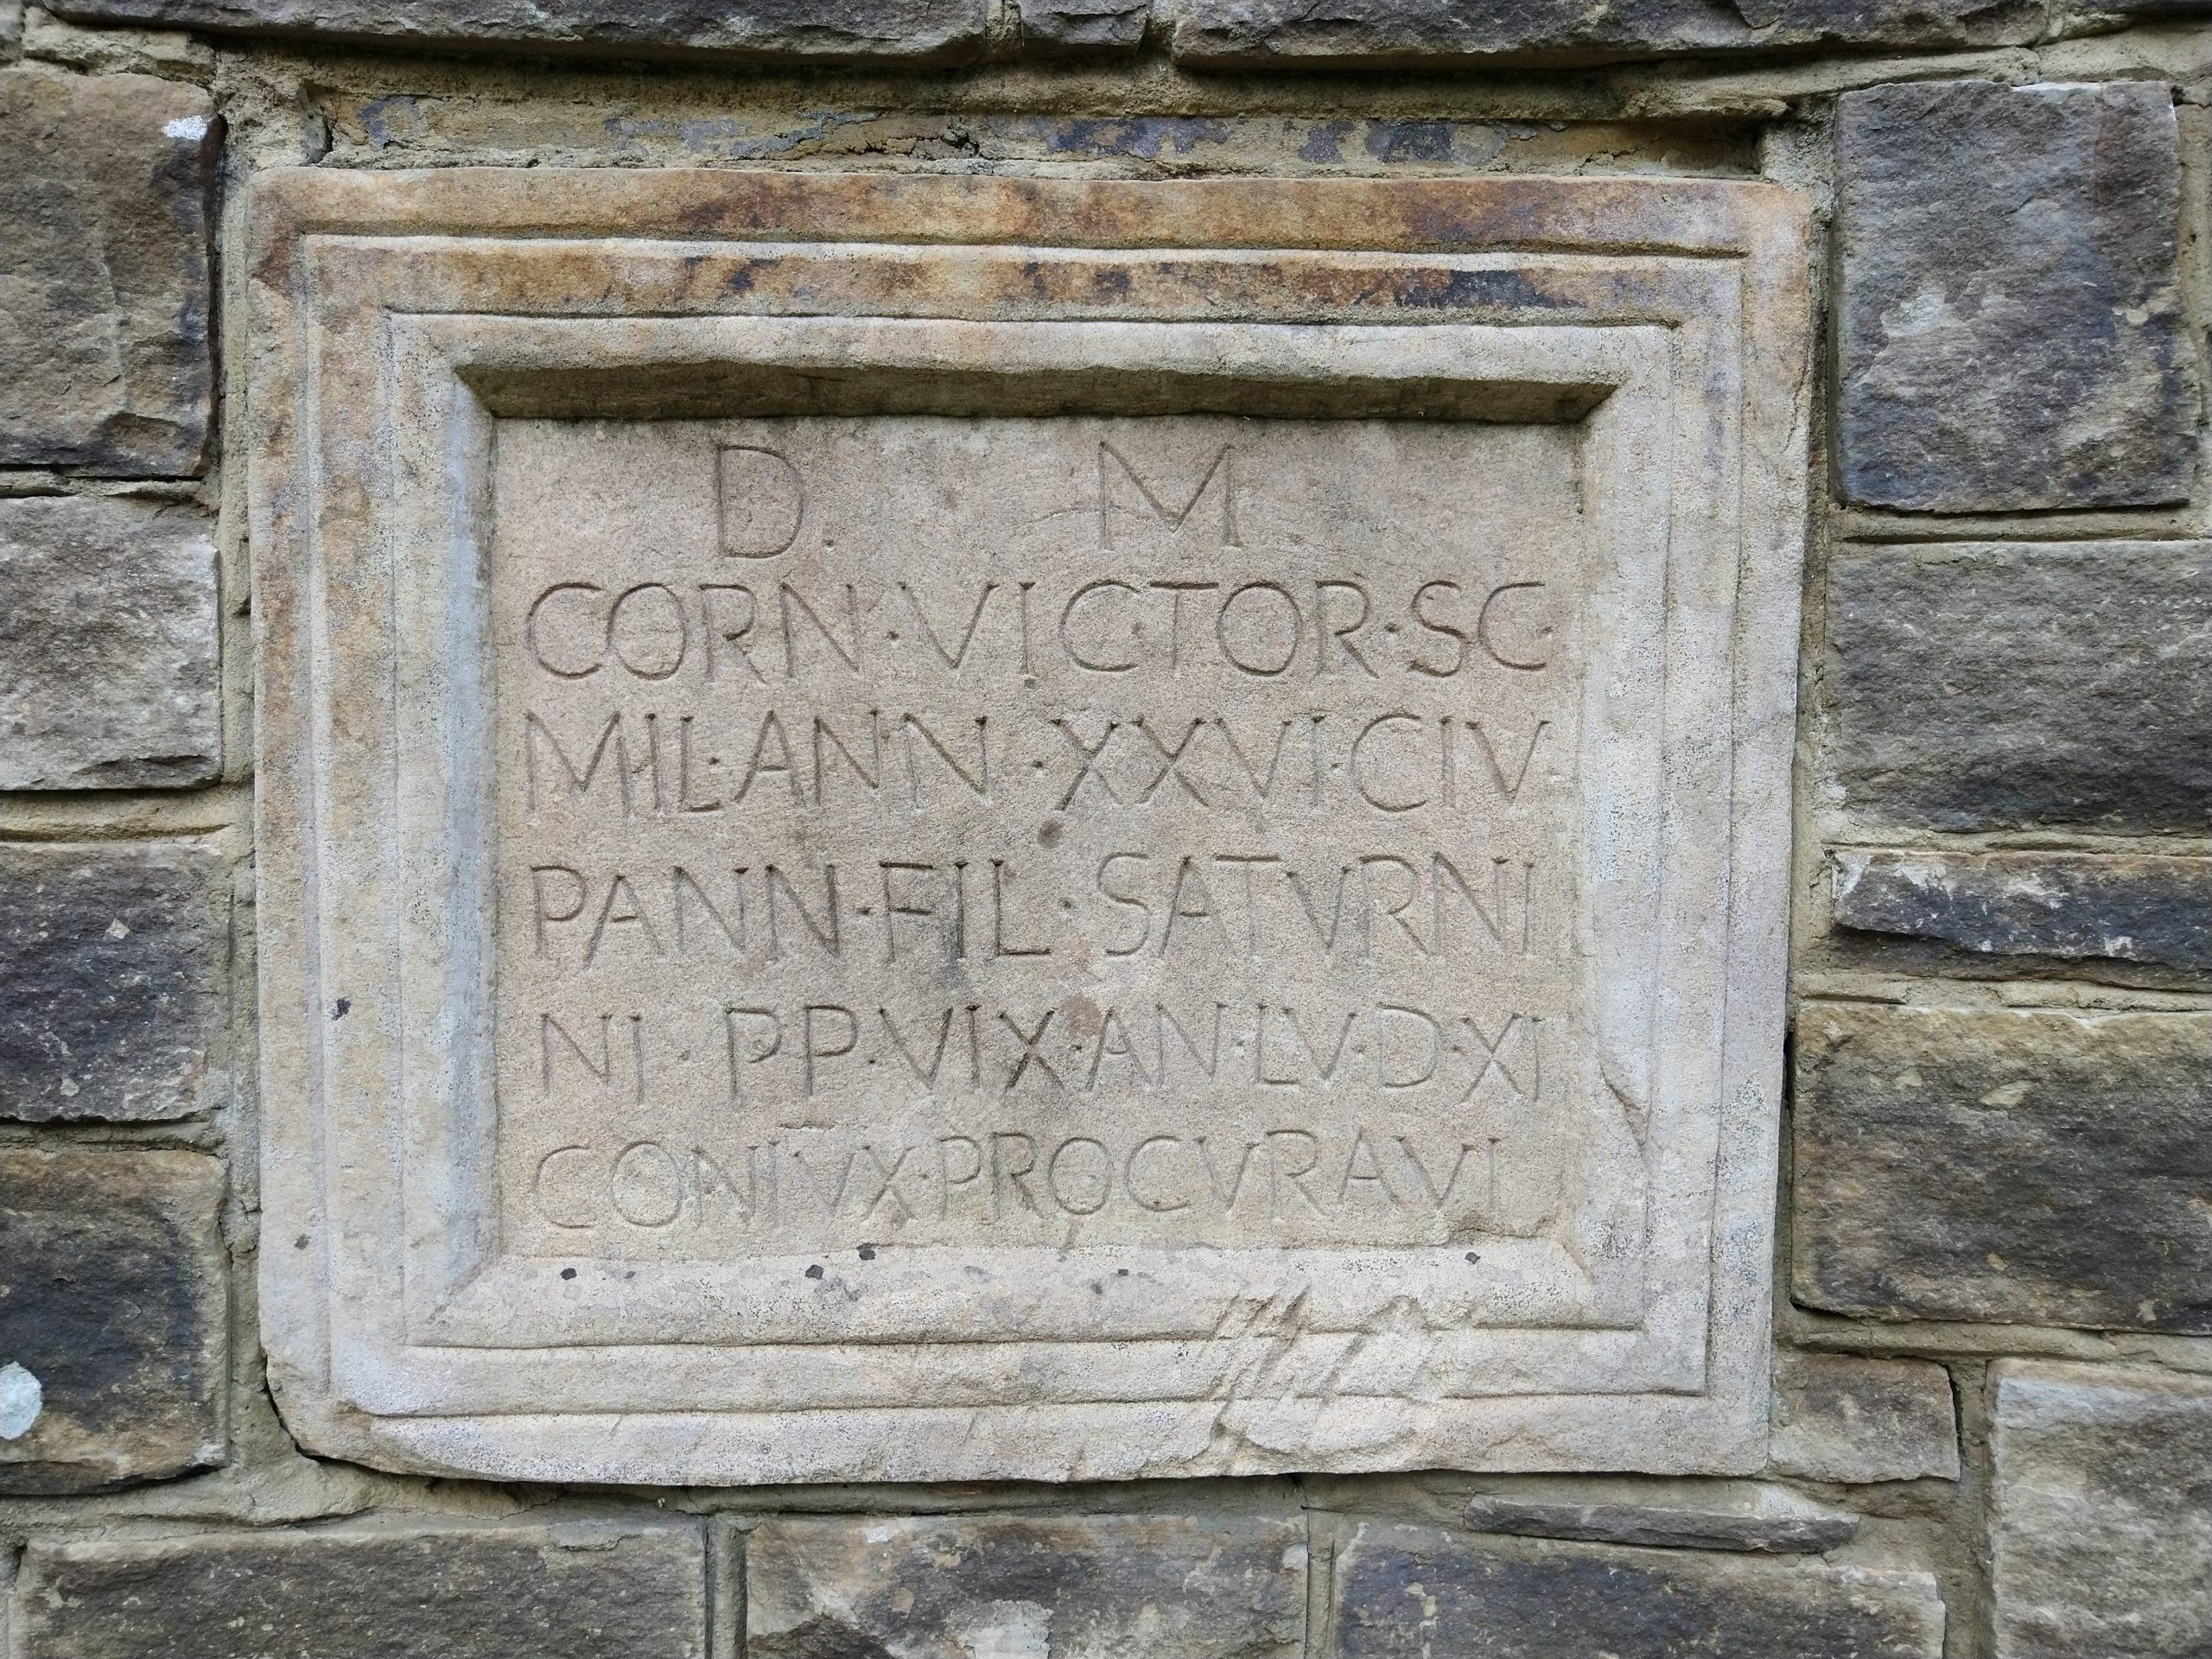 Reproduction of Roman gravestone at Vindolanda